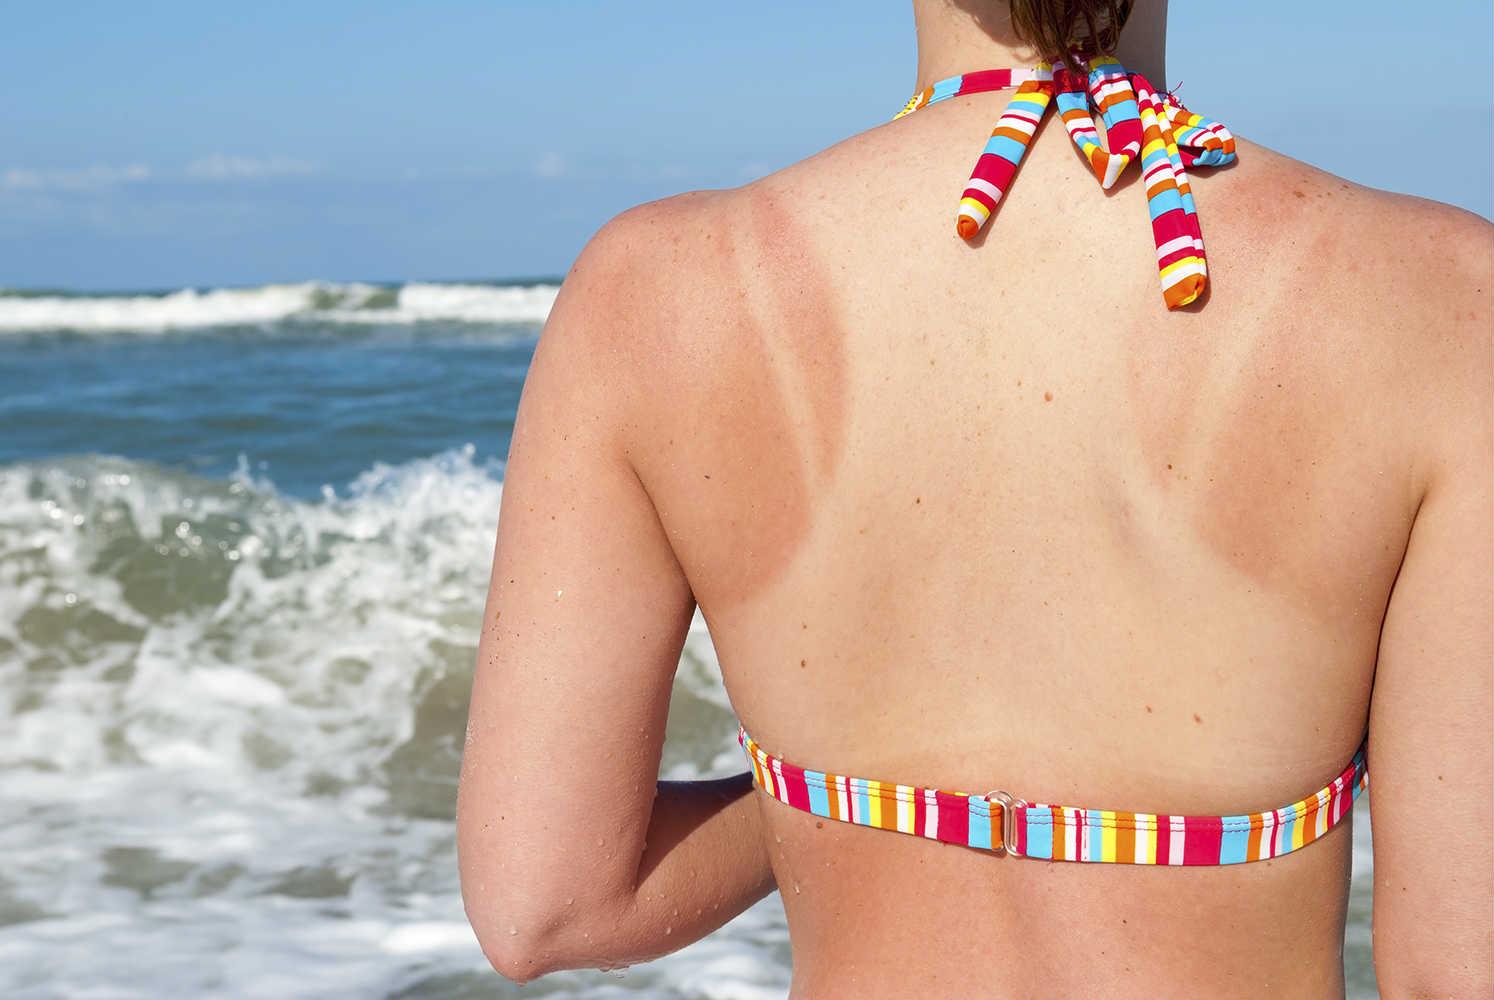 A woman having sunburn in summer